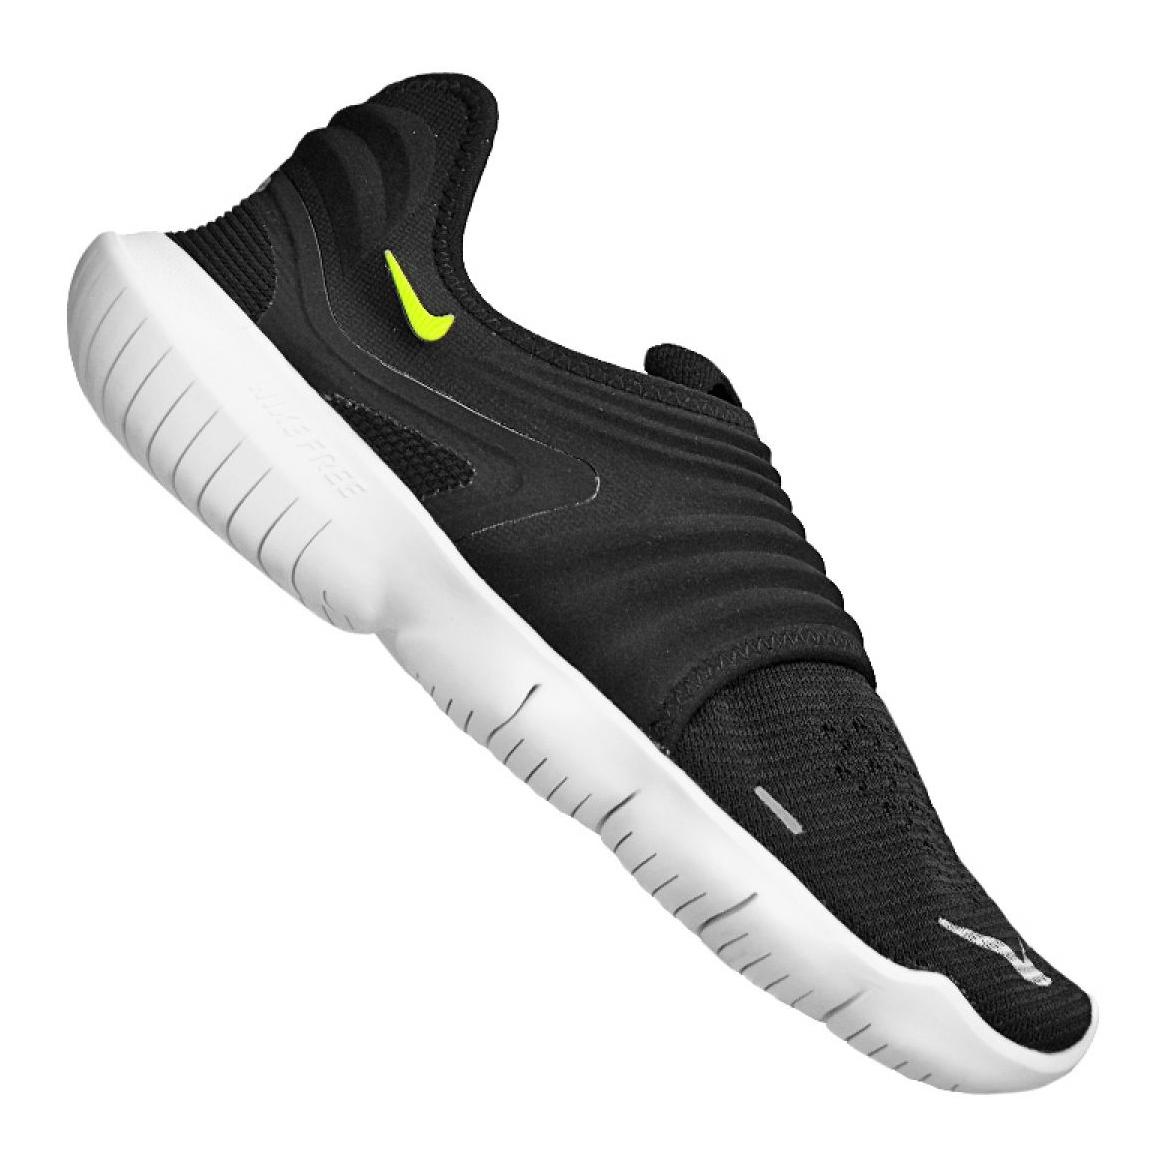 Masculino Nike Free 5.0 tênis de corrida Knitting Preto